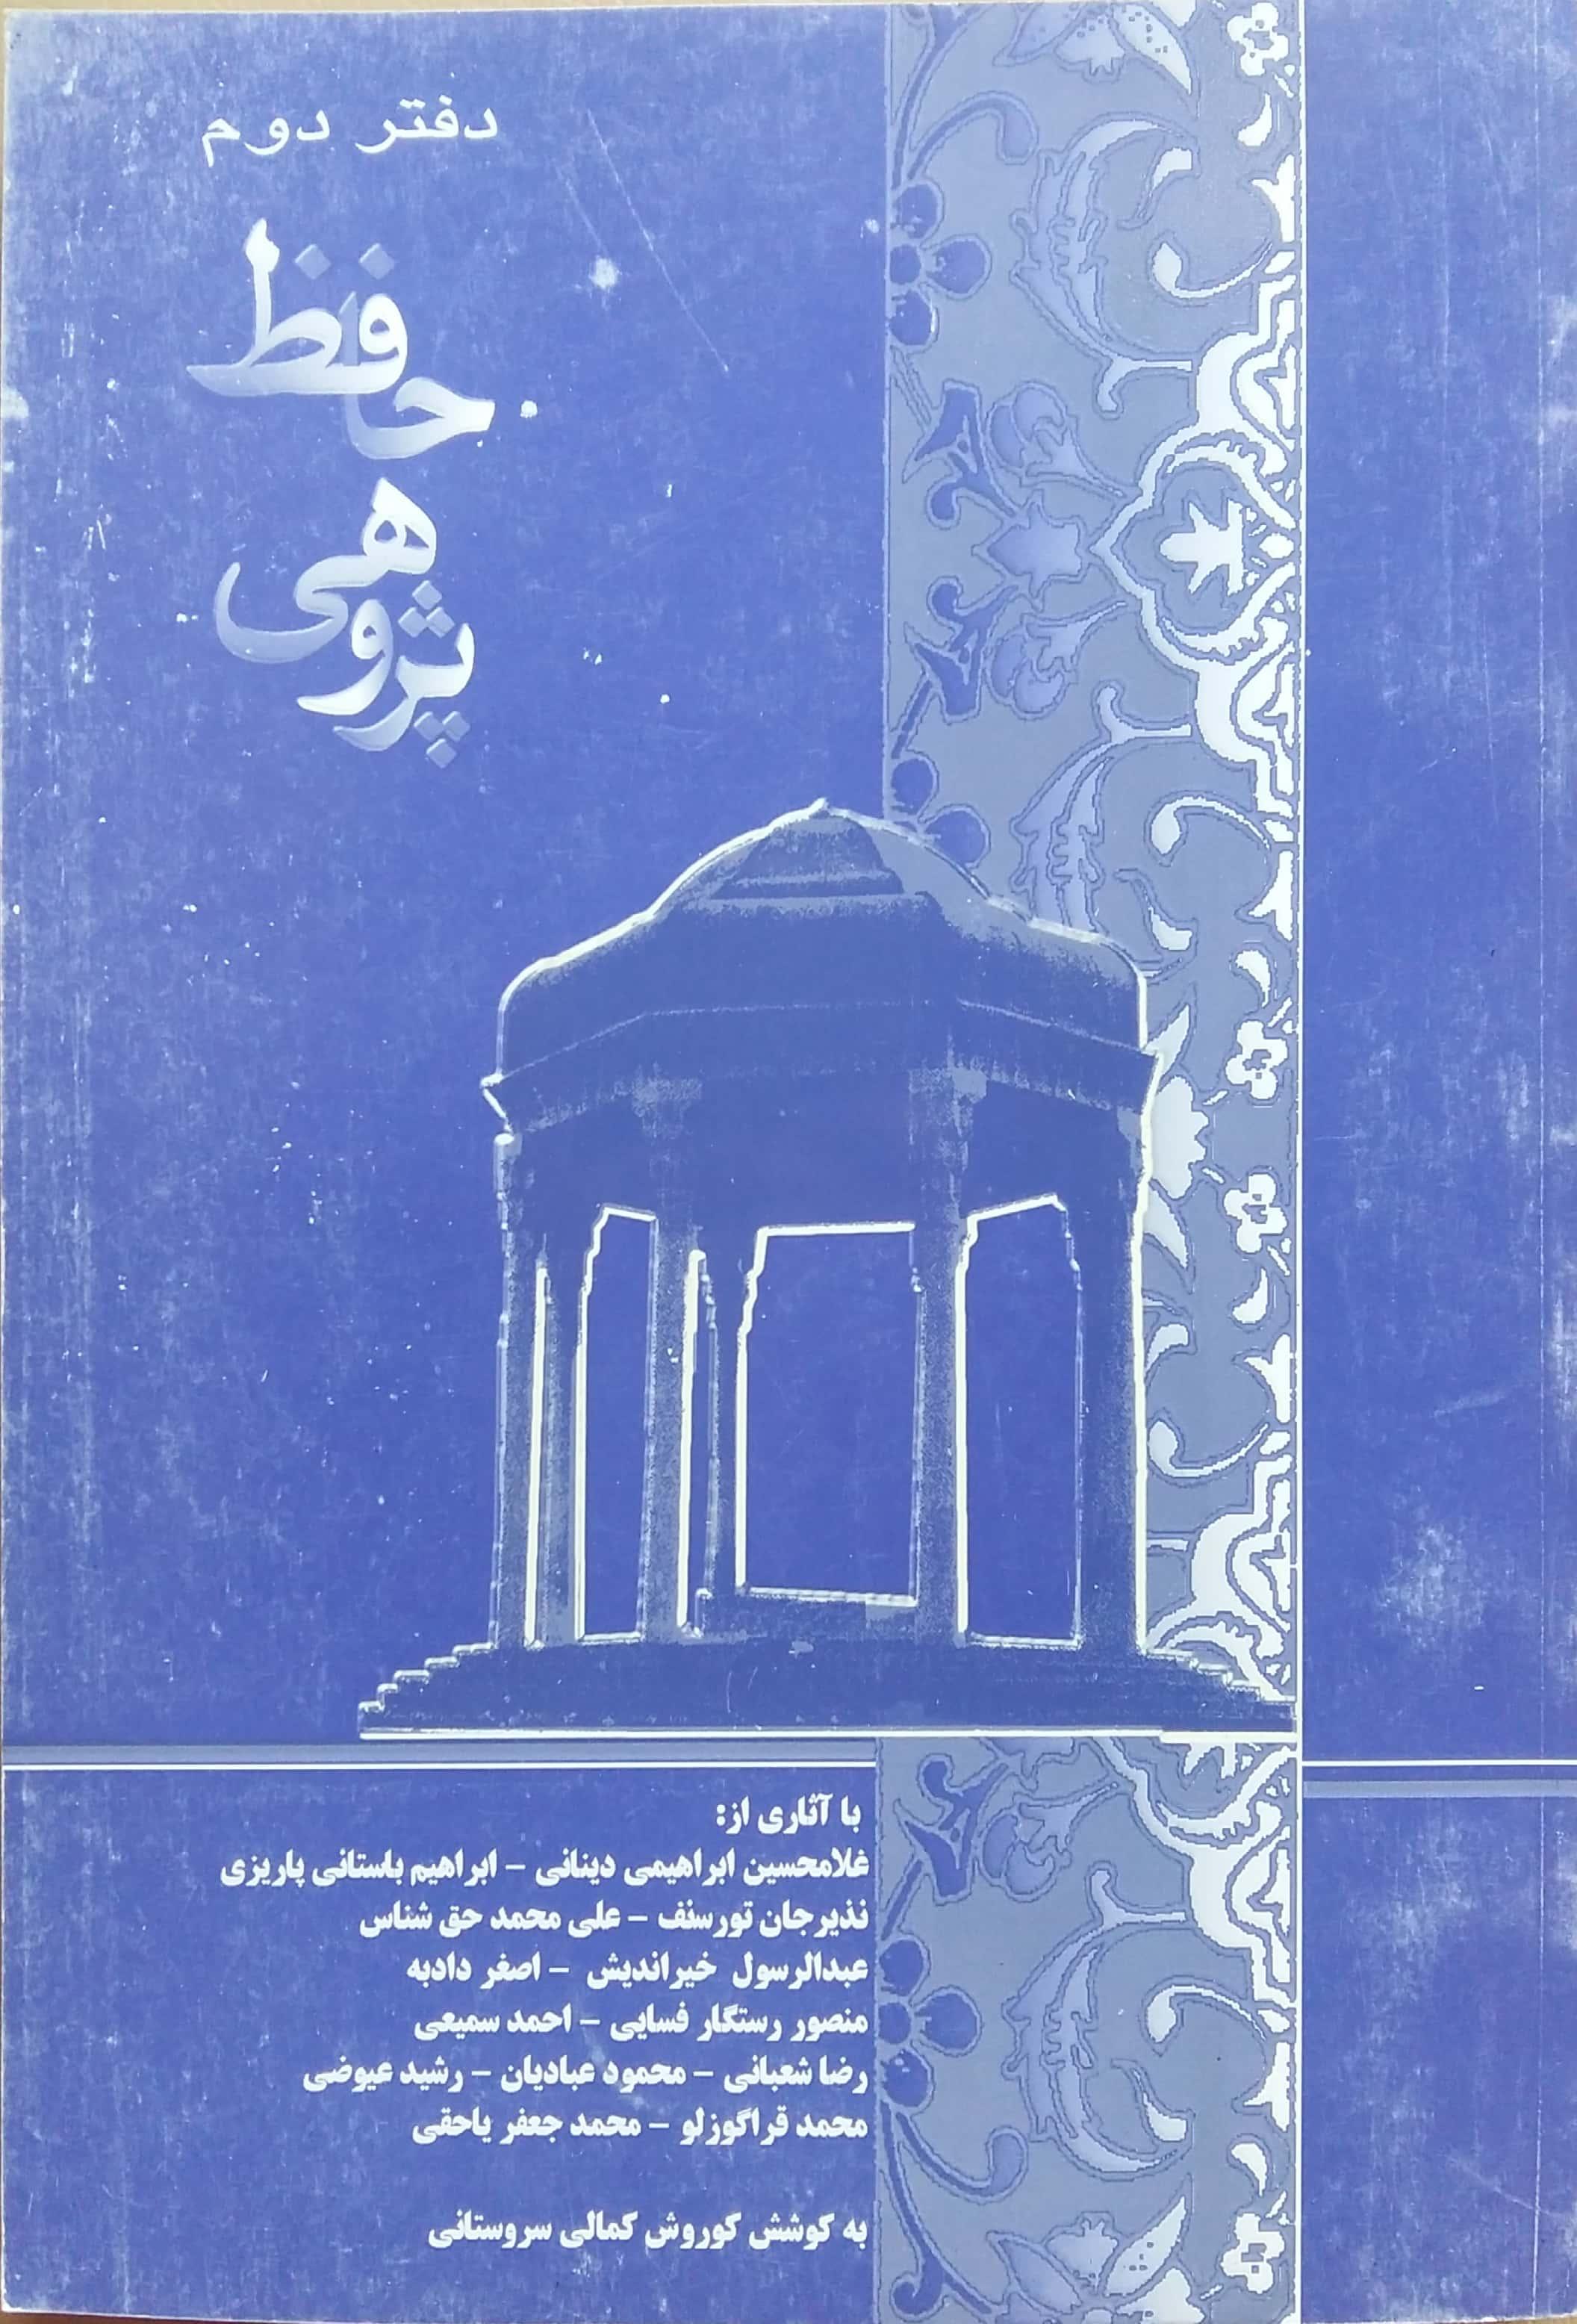 بنياد فارس شناسي حافظ پژوهی دفتر دوم (به کوشش کوروش کمالی سروستانی)